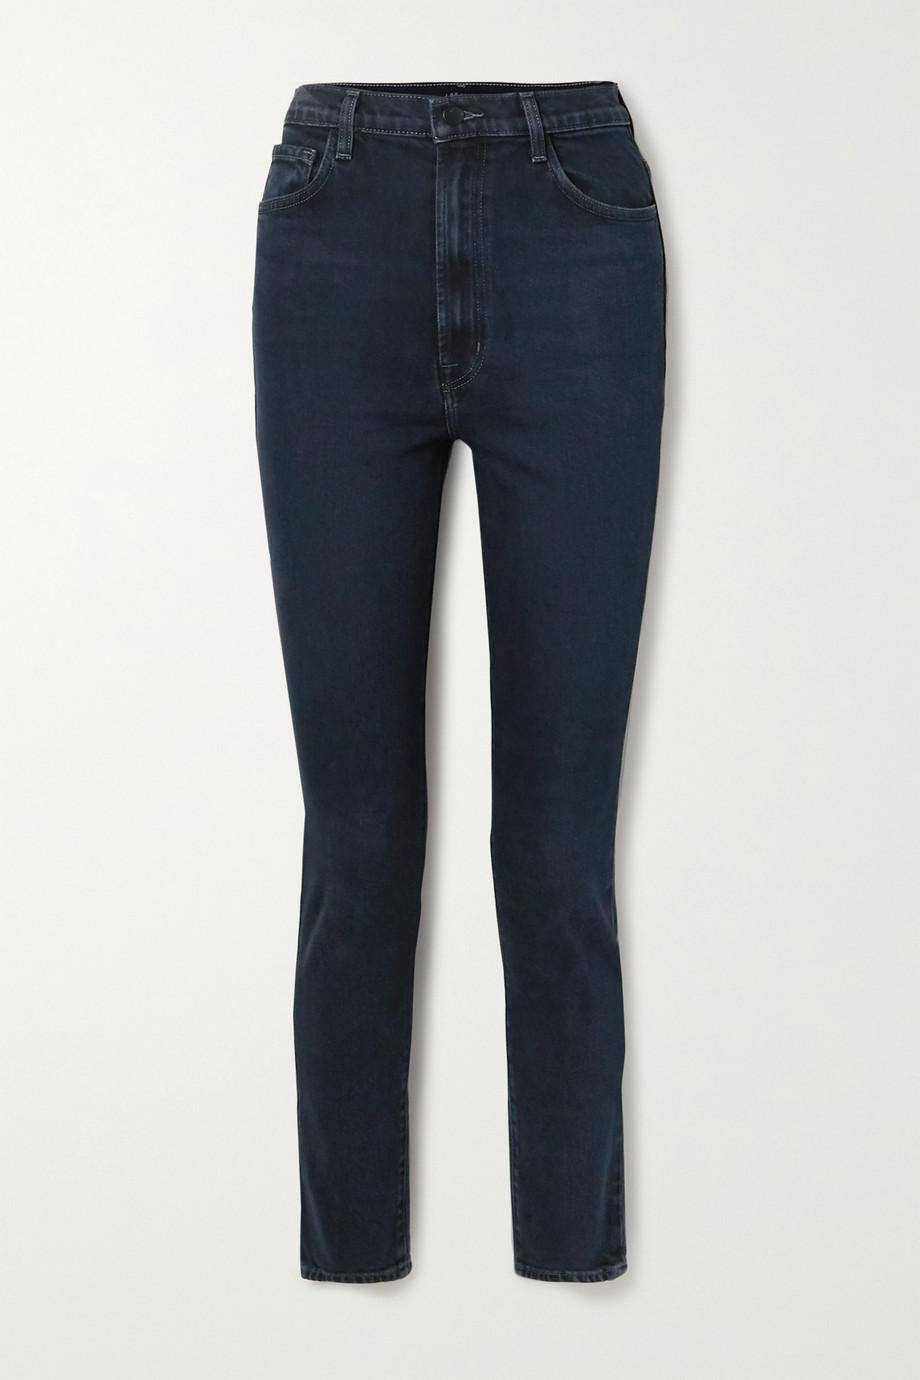 J Brand 1212 Runway high-rise slim-leg jeans